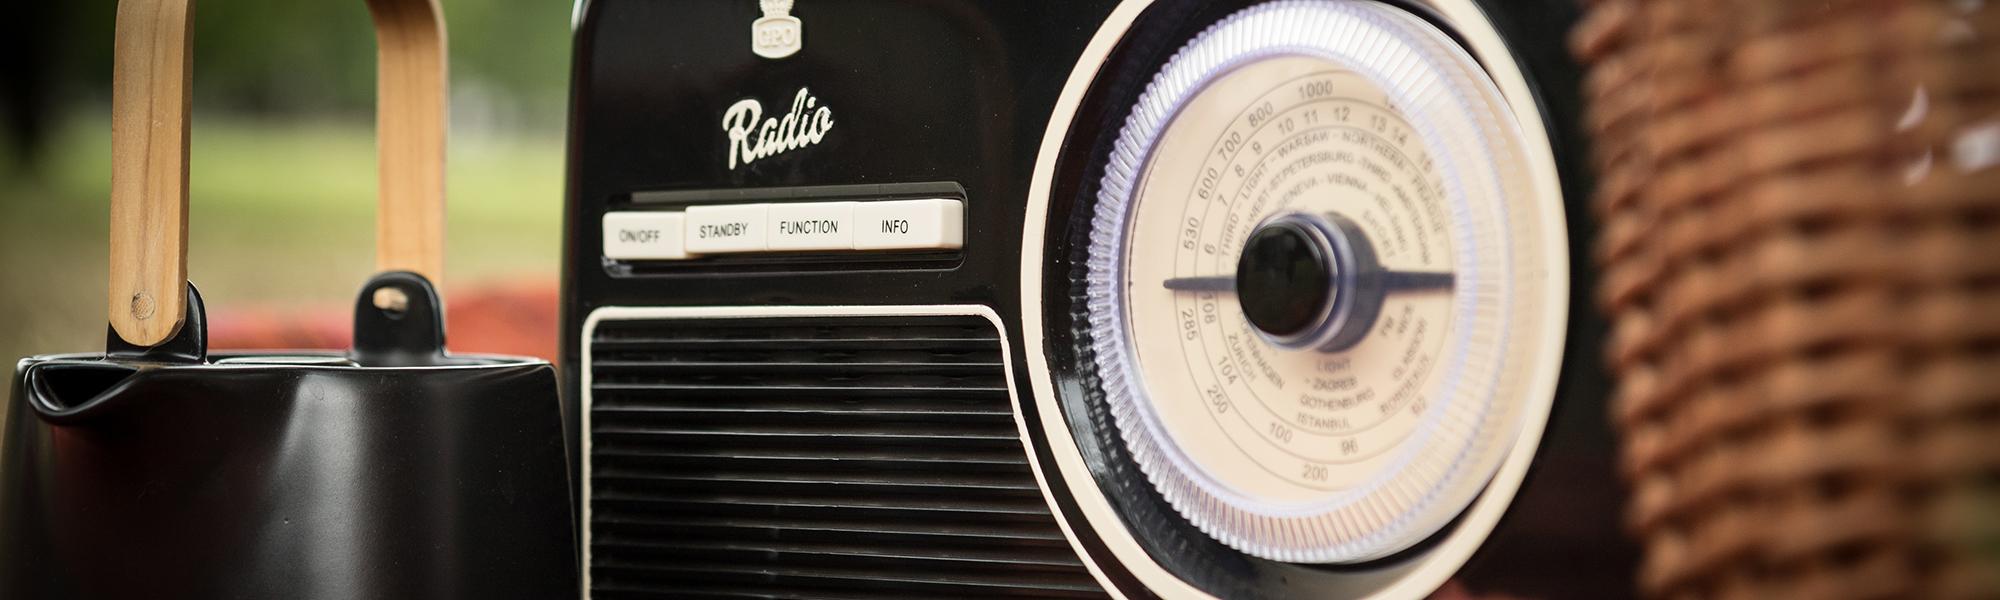 Retro Digital Radios, Cheap Digital Radios, Cheap DAB Radios